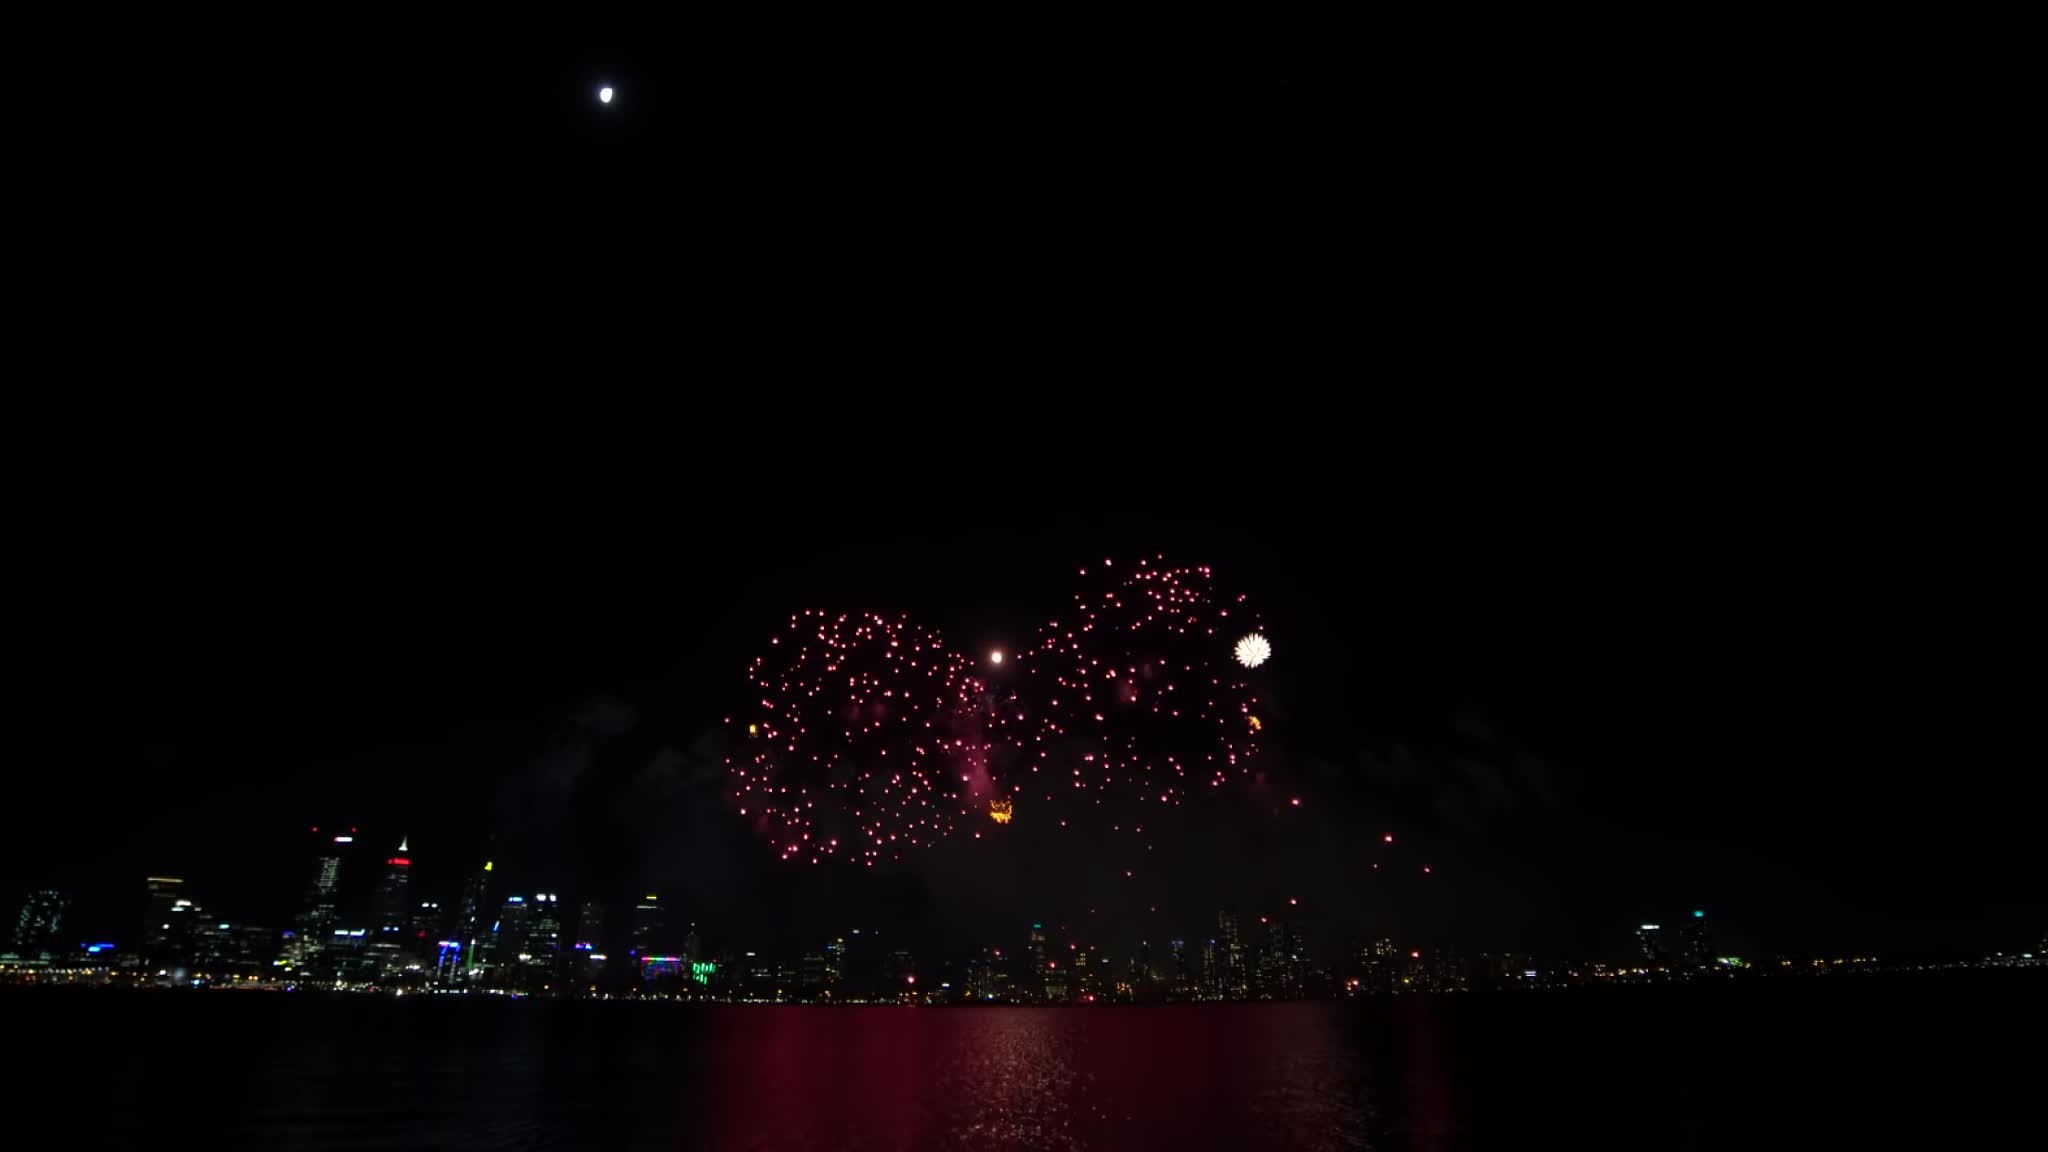 A9, Australia, Day, Full length, Matt Lim, People & Blogs, Skyworks, Sony, australia day, fireworks, perth, western australia, 2018 Australia Day Fireworks, Perth Western Australia GIFs